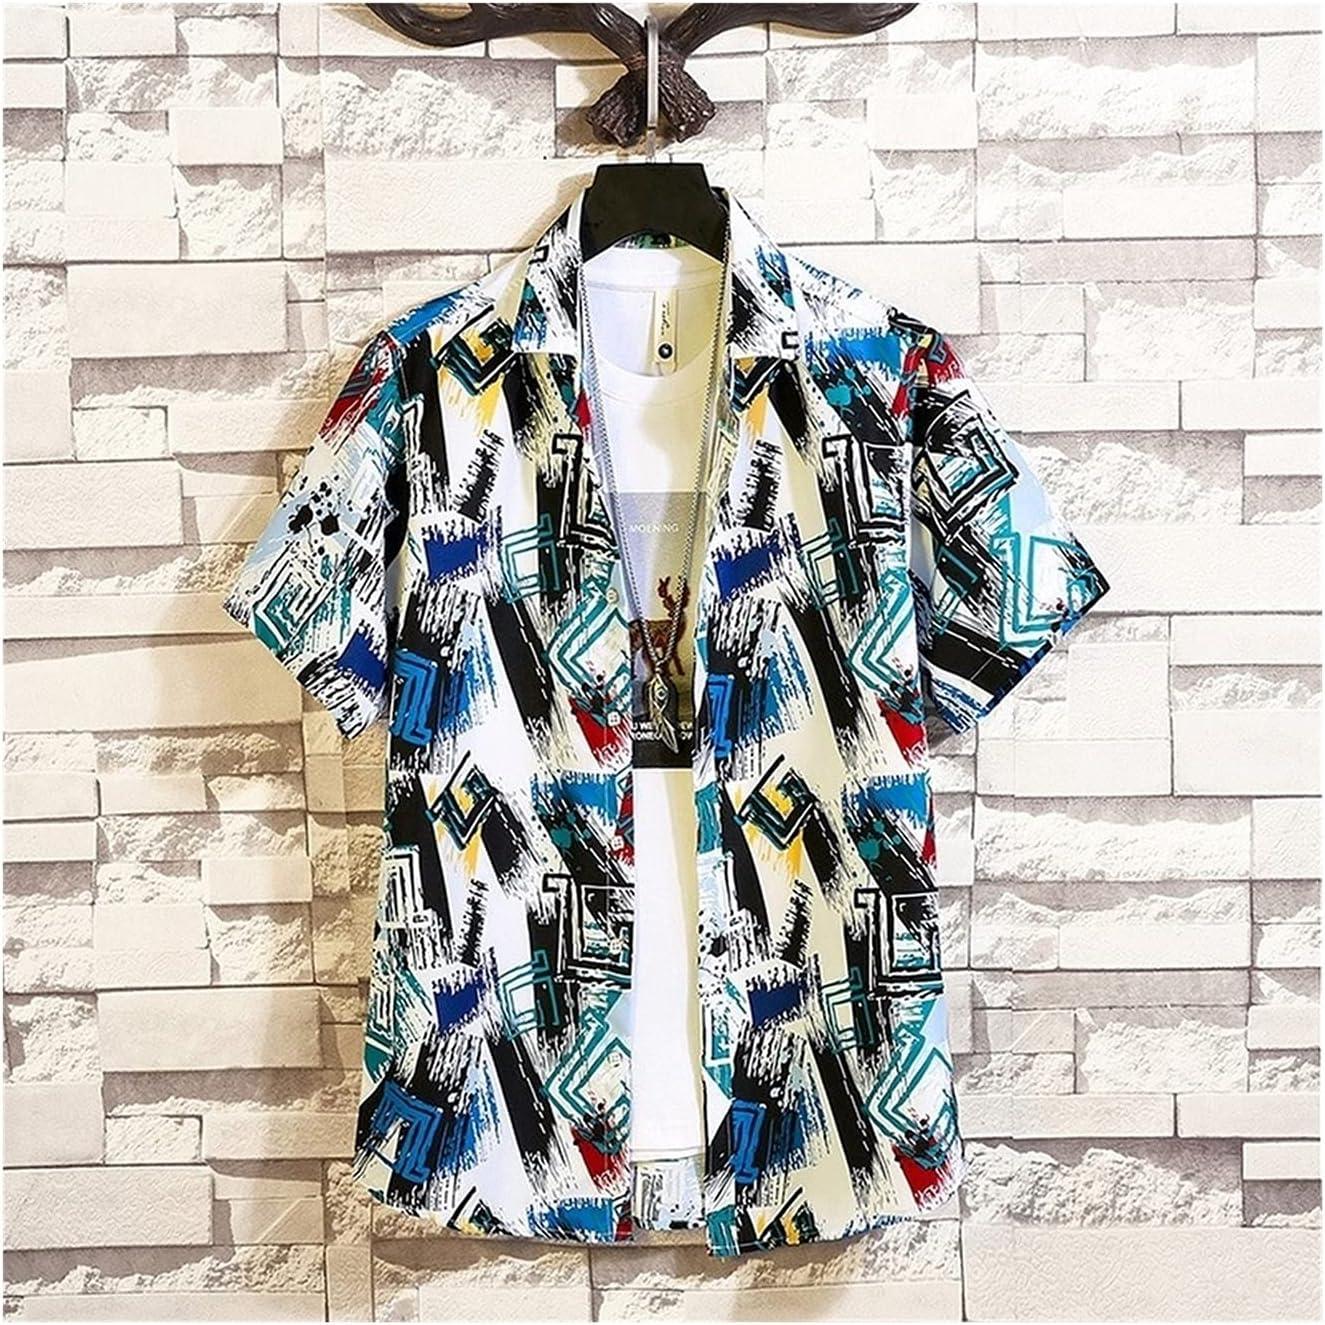 GUOQUN-SHOP Hawaiian Shirt Popular products Men Clothing Holiday Wear Fashion Max 79% OFF